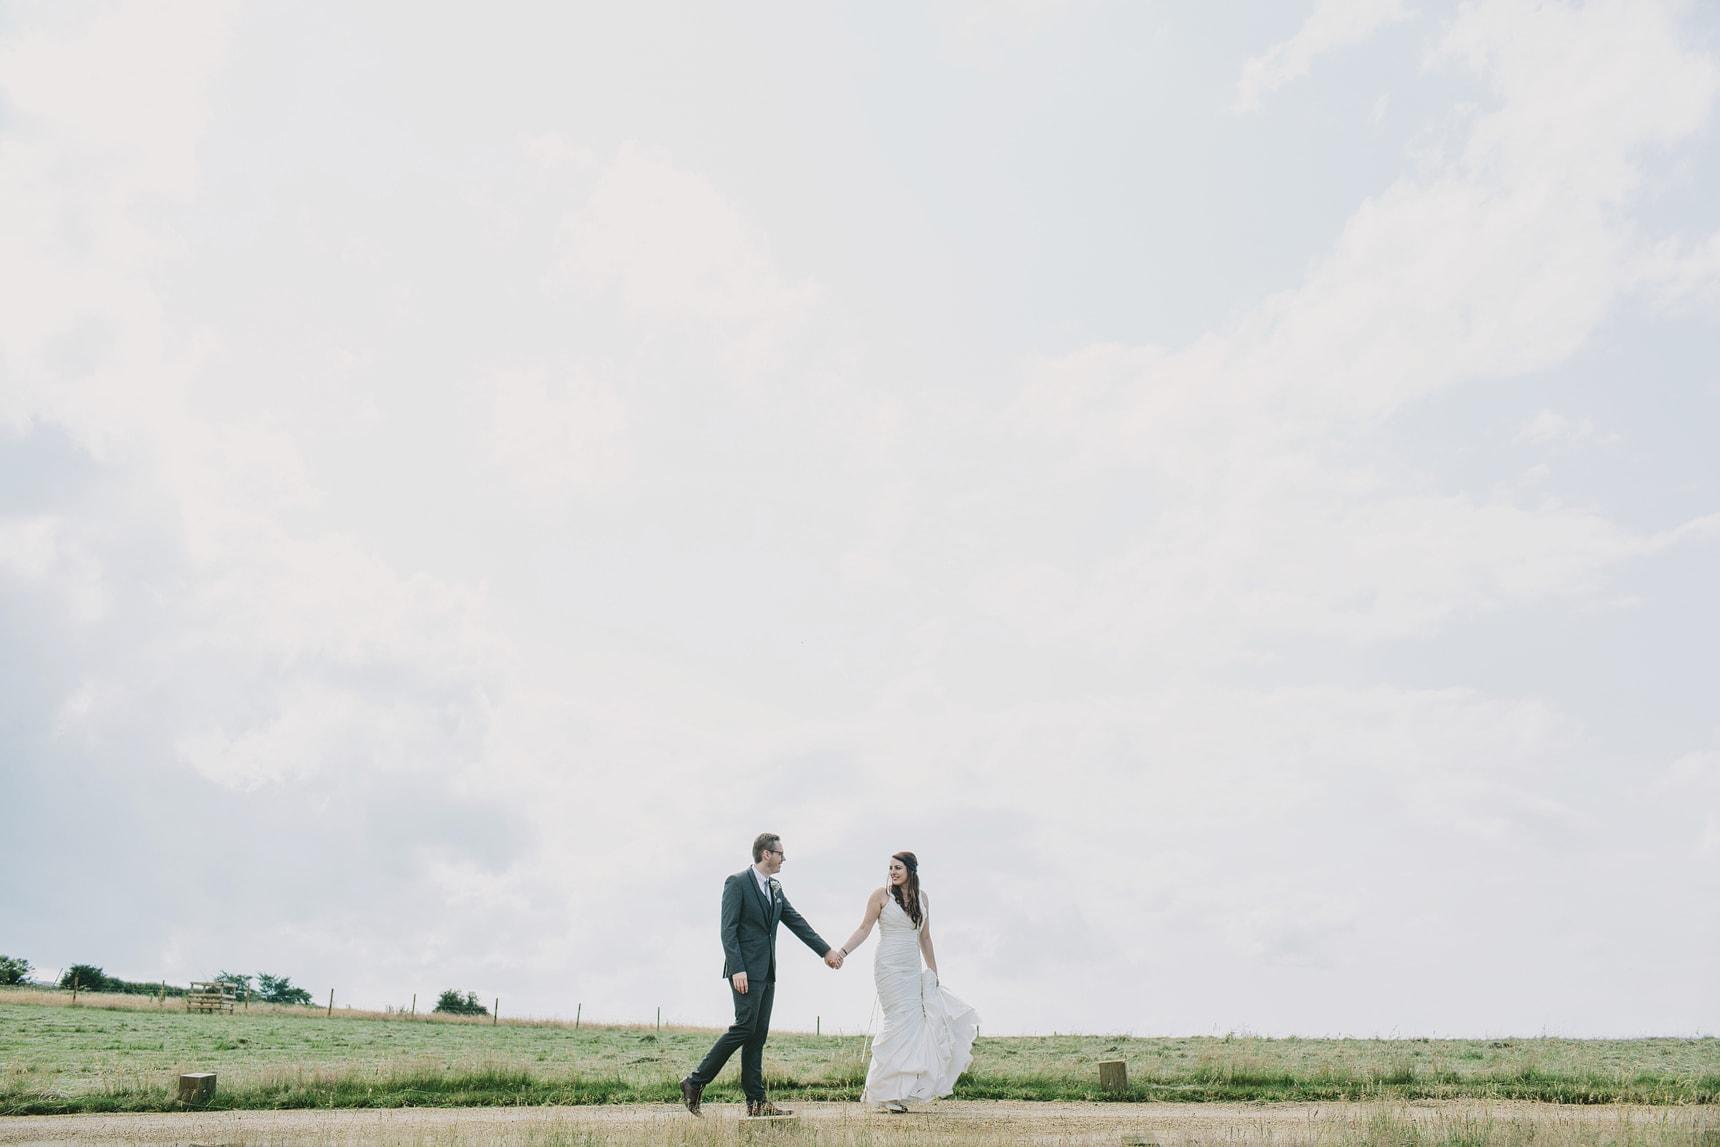 creative uk weddings portrait photographer